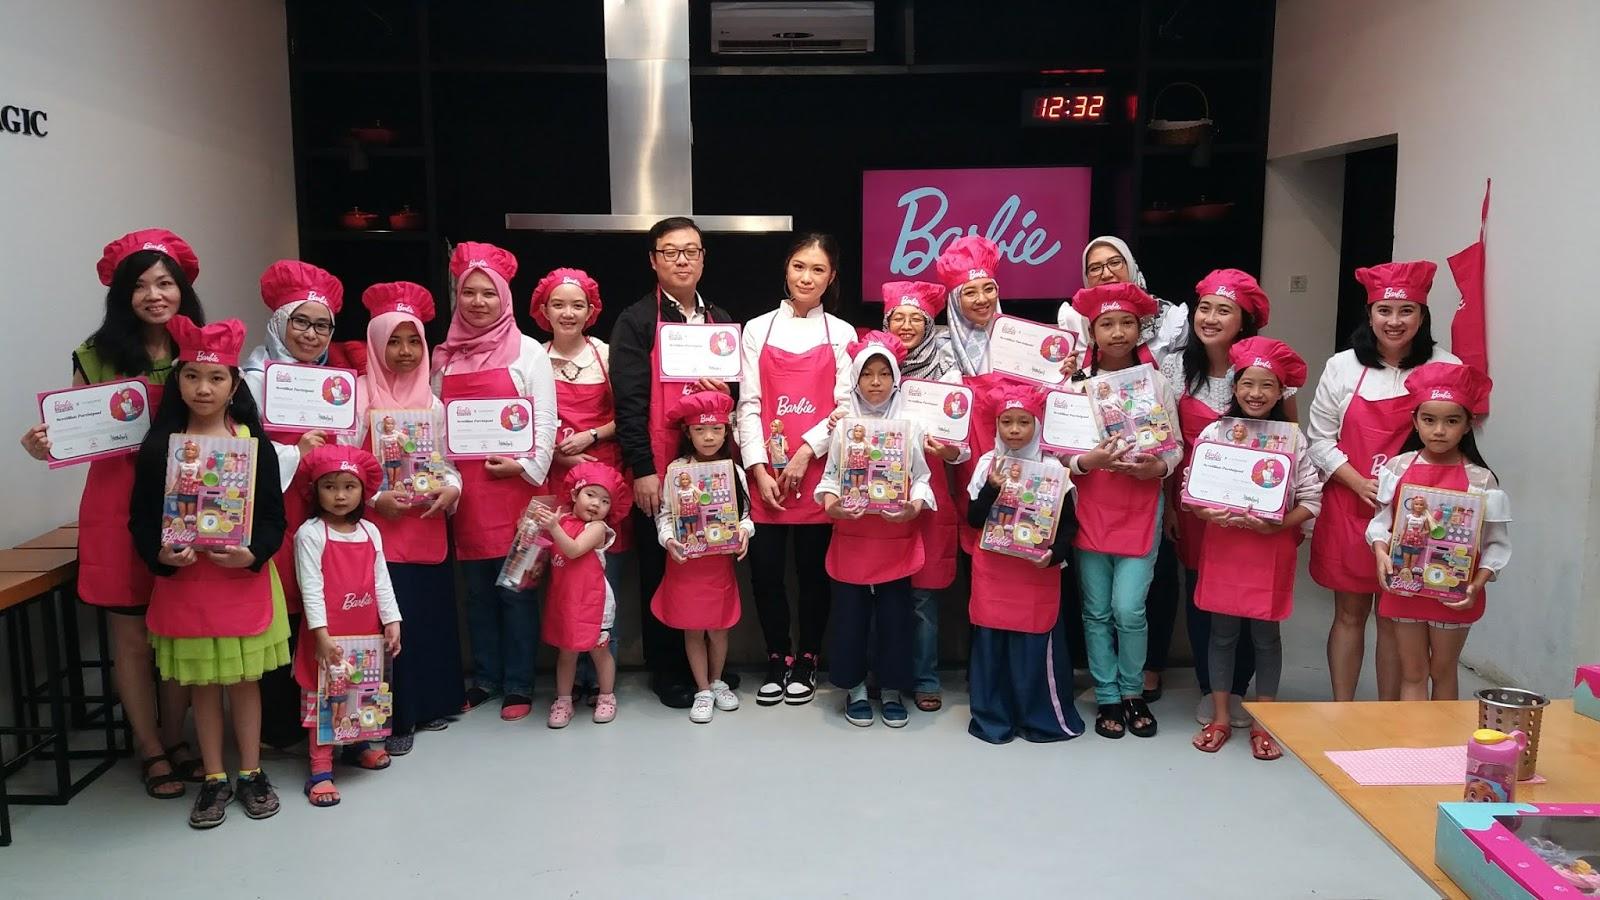 Serunya Masak Bersama Barbie Rina Susanti S Blog